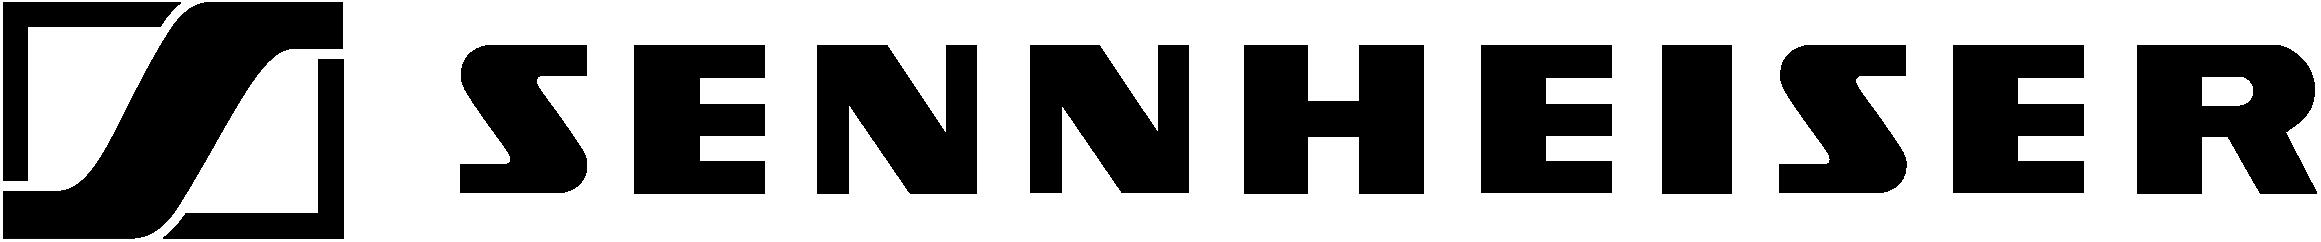 Sennheiser logo.jpg